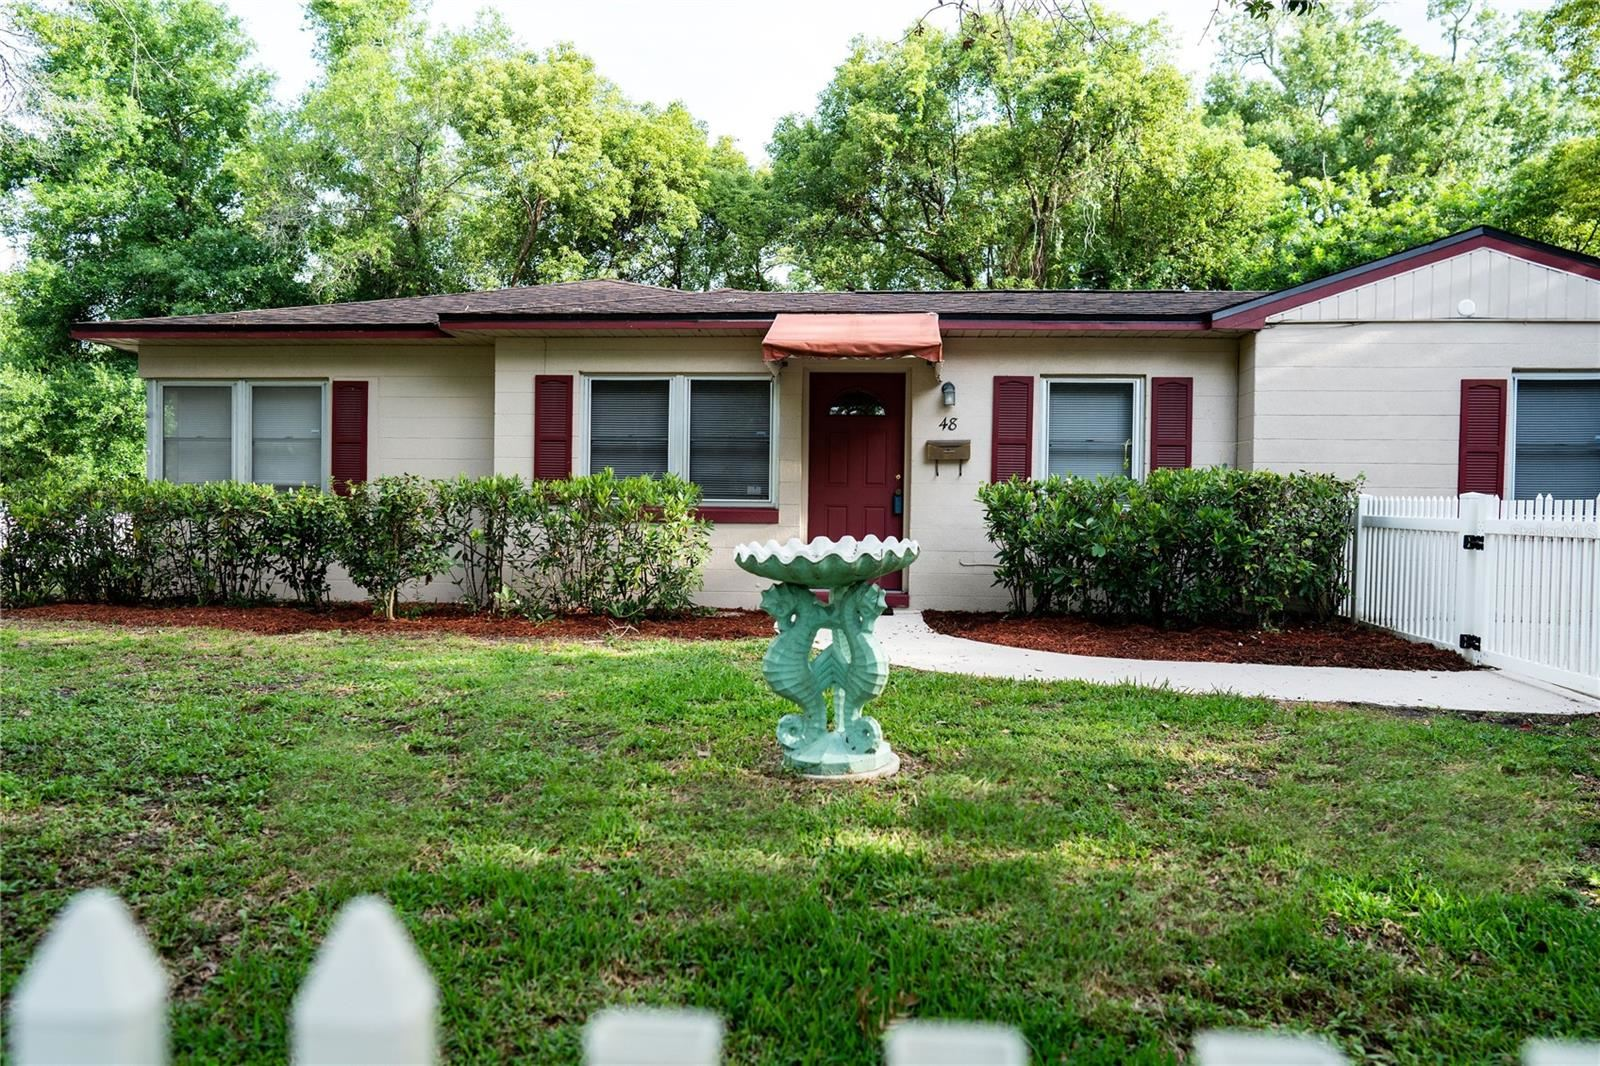 48 E KING STREET, Orlando, FL 32804 - MLS#: O5942540